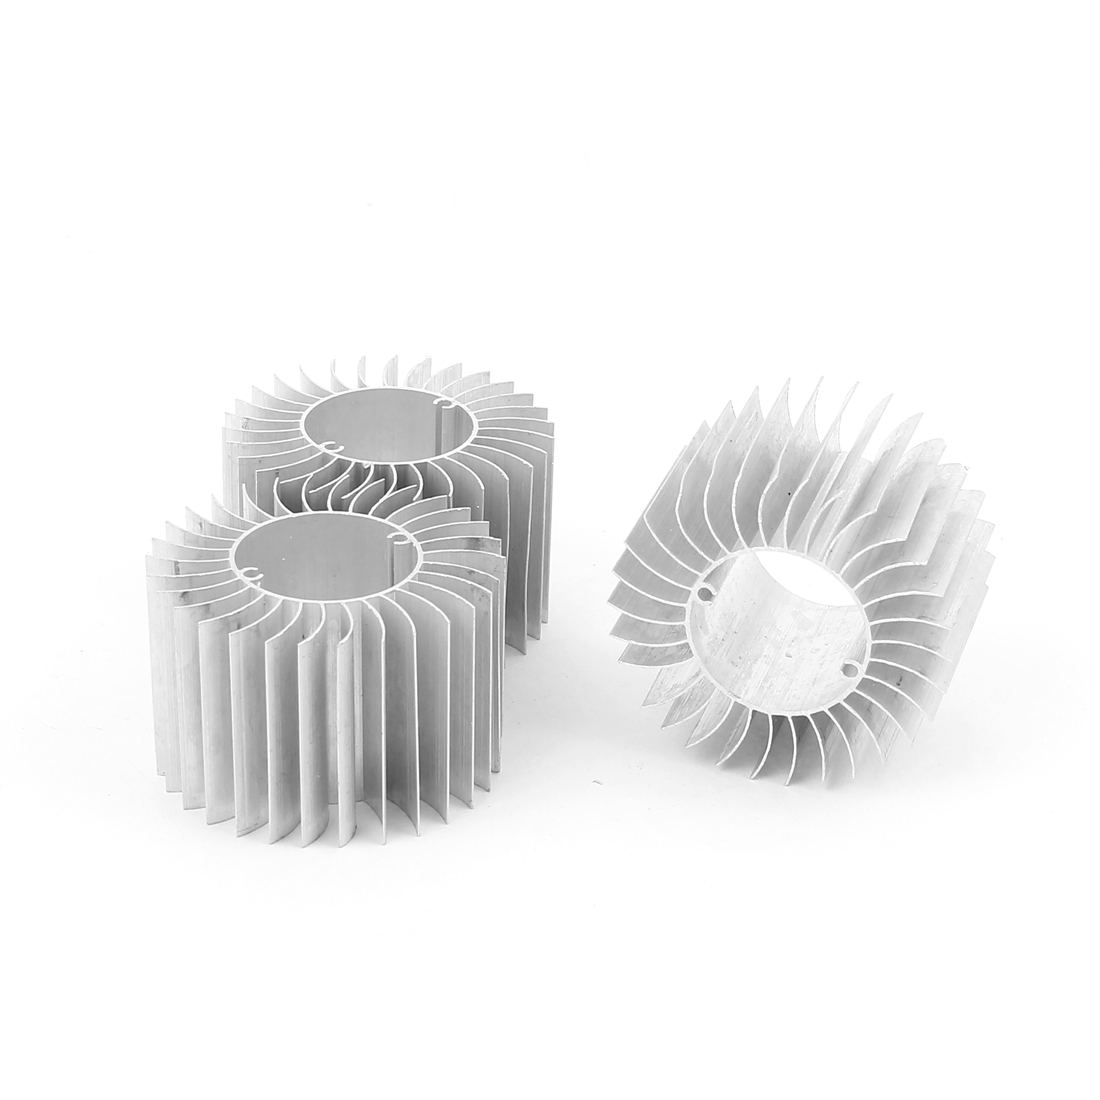 3 Pcs Led Lamp Aluminum Heatsink Radiator Cooling Fin 57mmx29mmx37mm Silver Tone